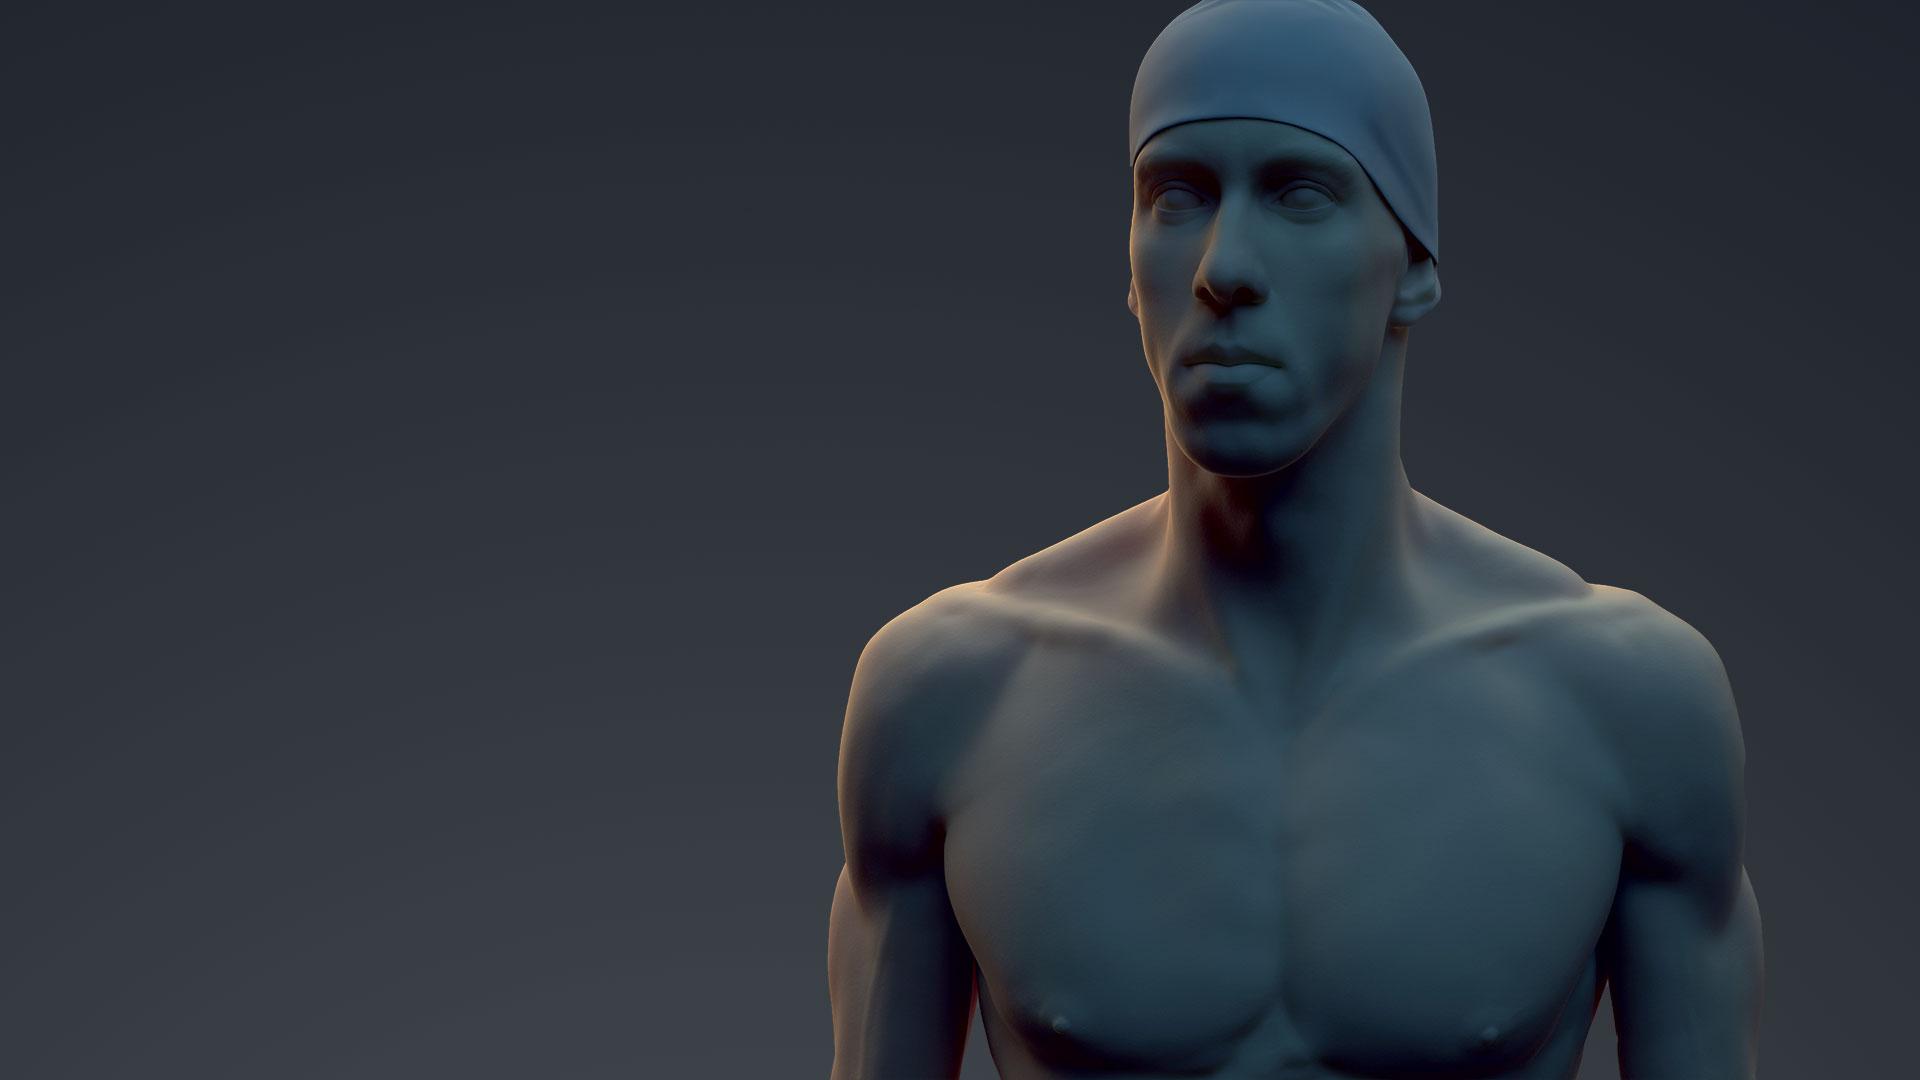 Sculpt Realistic Anatomy In Zbrush Creative Bloq